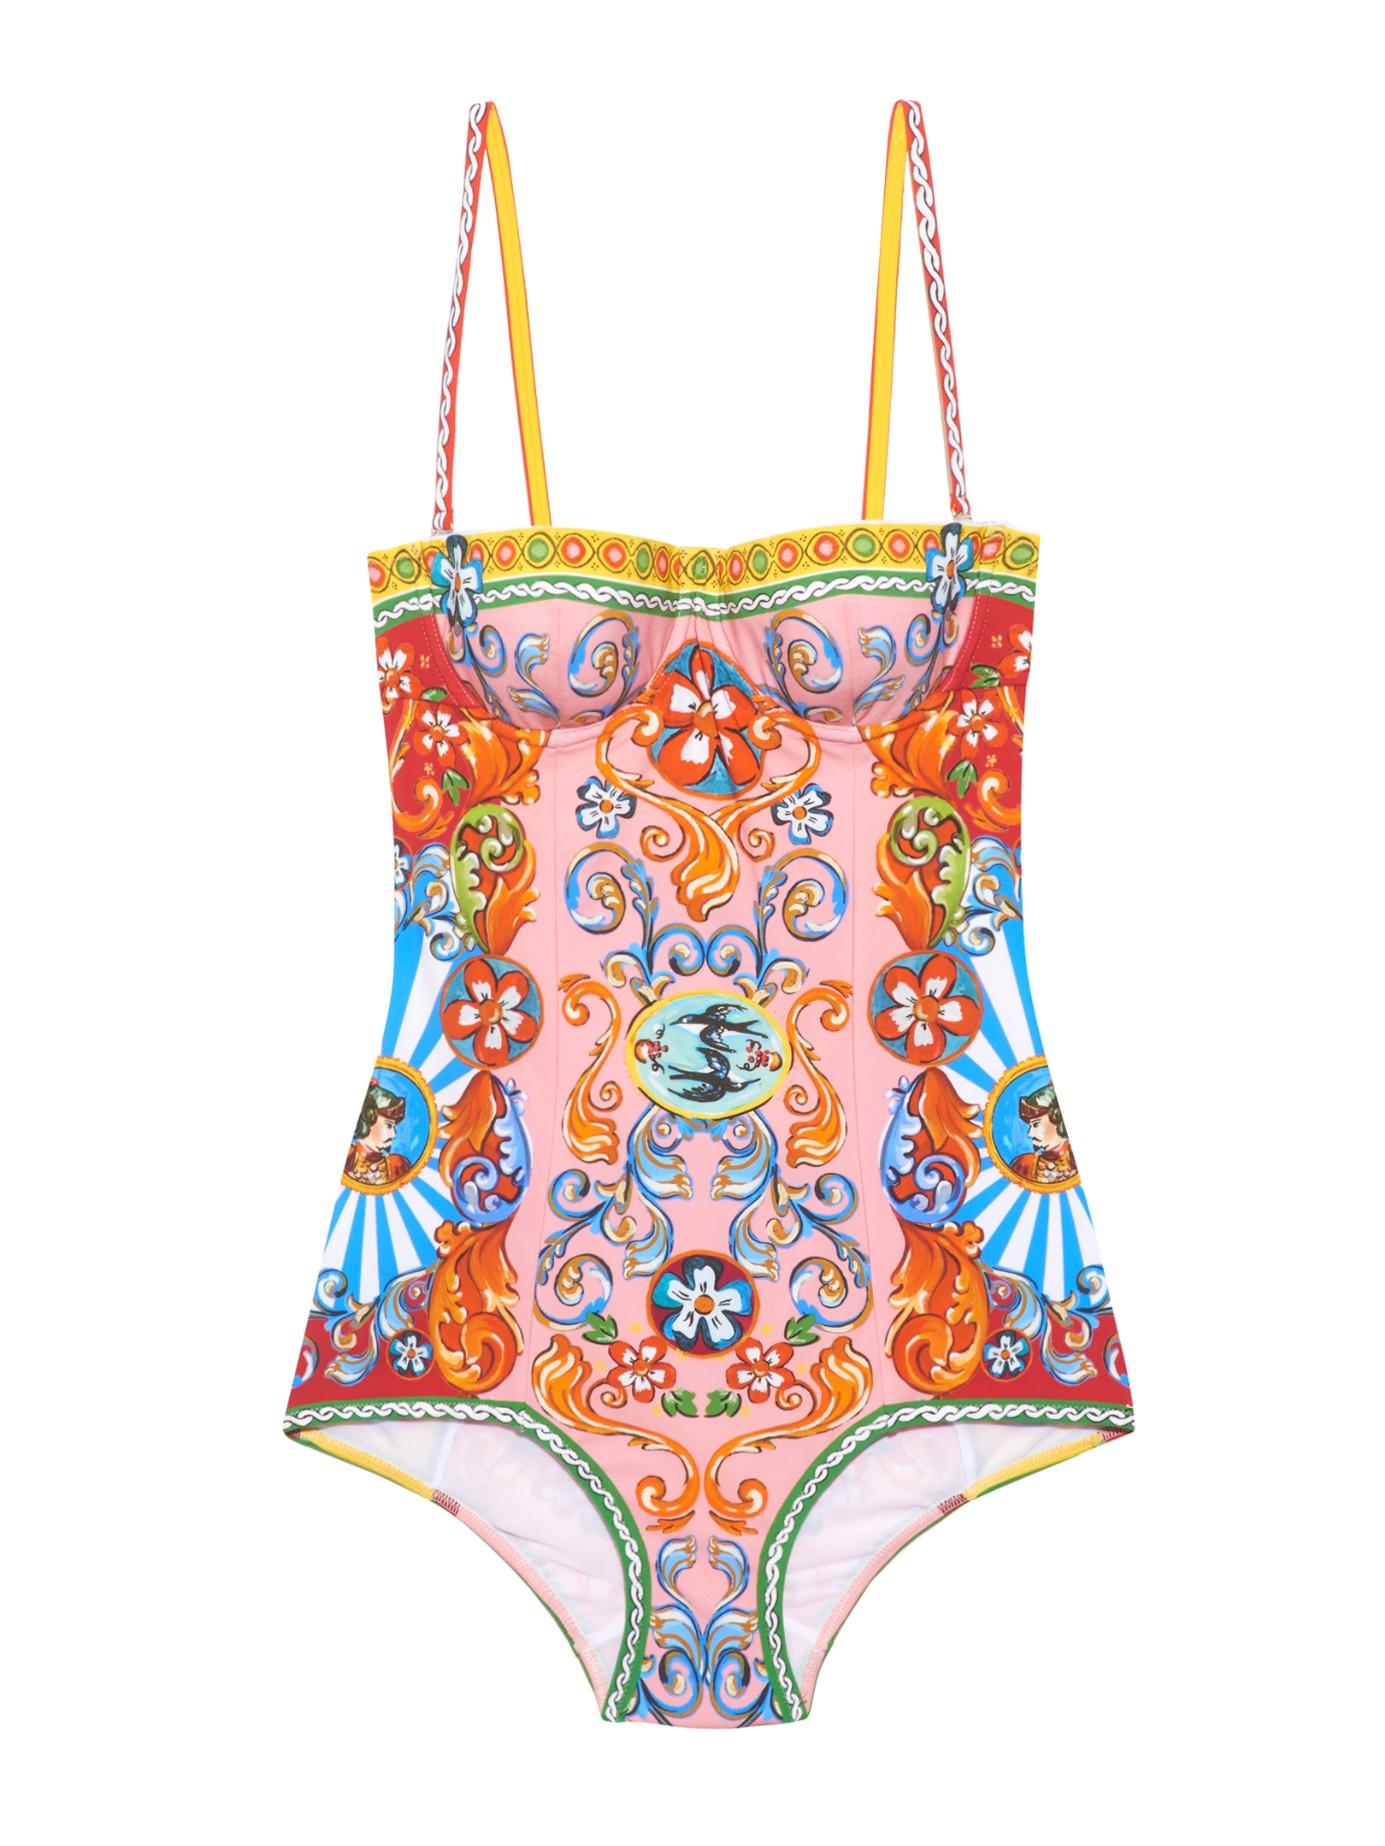 Lyst - Dolce   Gabbana Carretto-print Balconette Swimsuit a5a27e4dffe